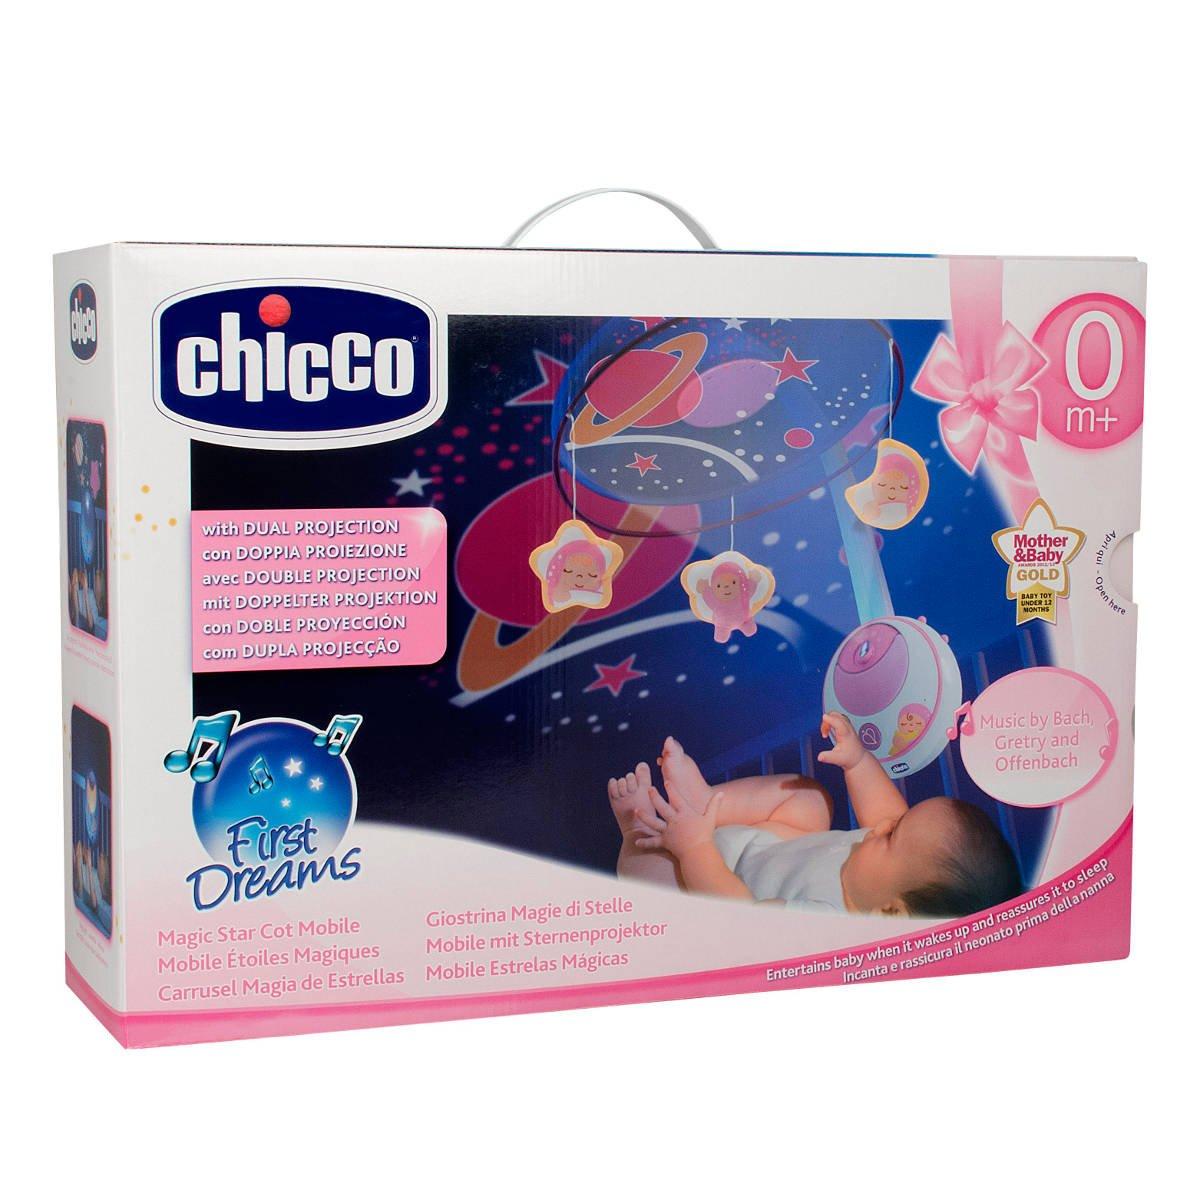 Chicco Mobile mit Sternenprojektor